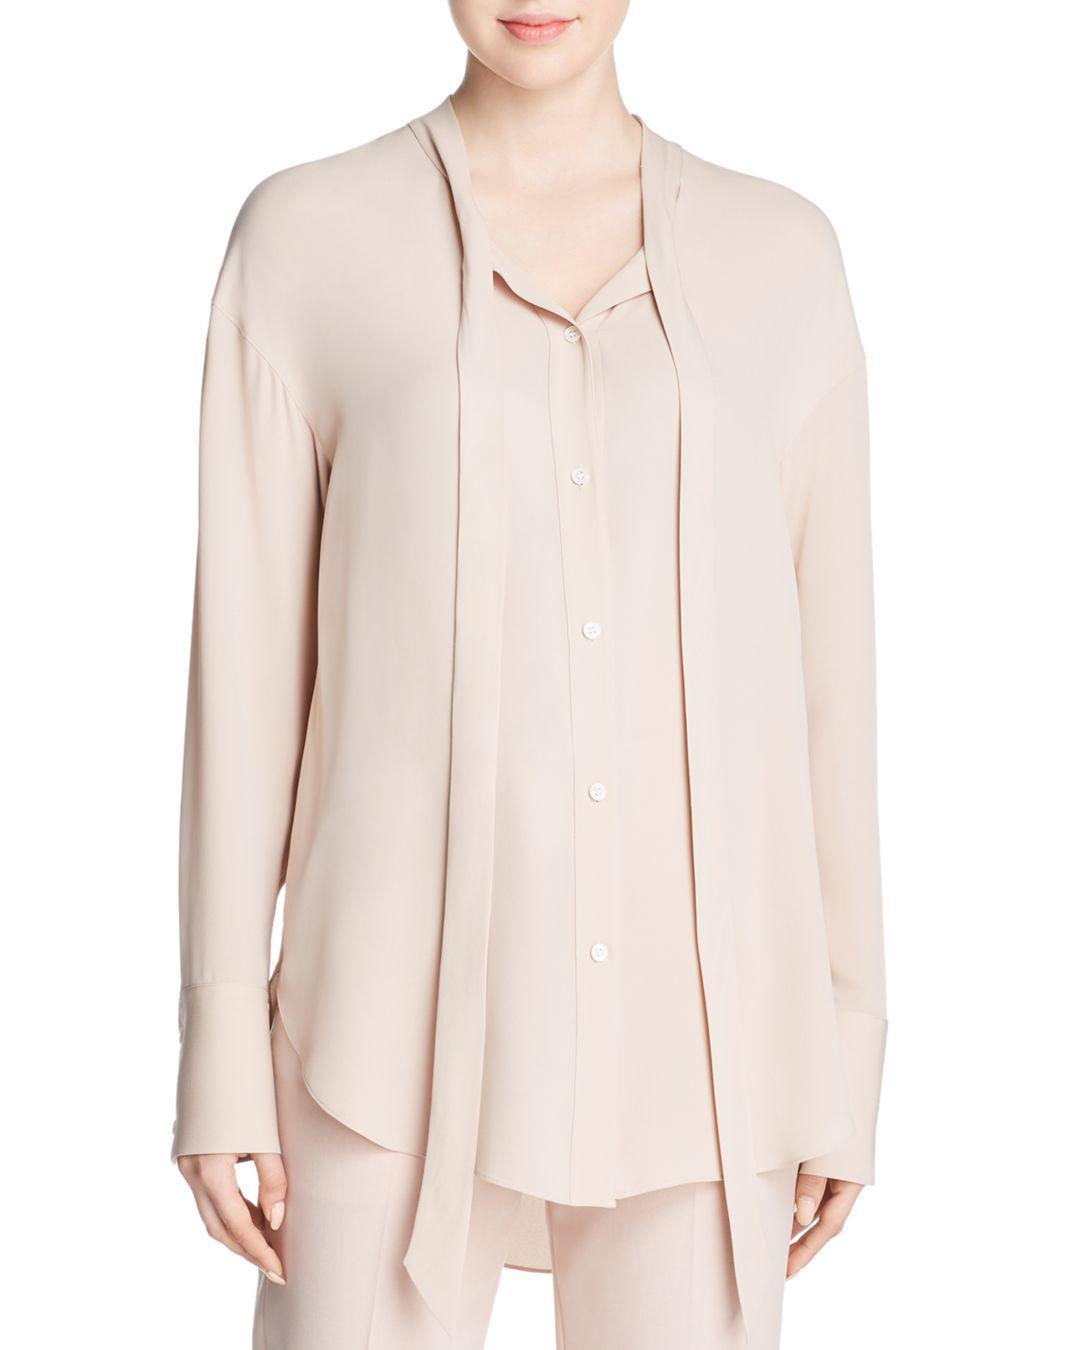 09021abfb94c62 Theory Weekender Tie-neck Silk Shirt in Pink - Lyst